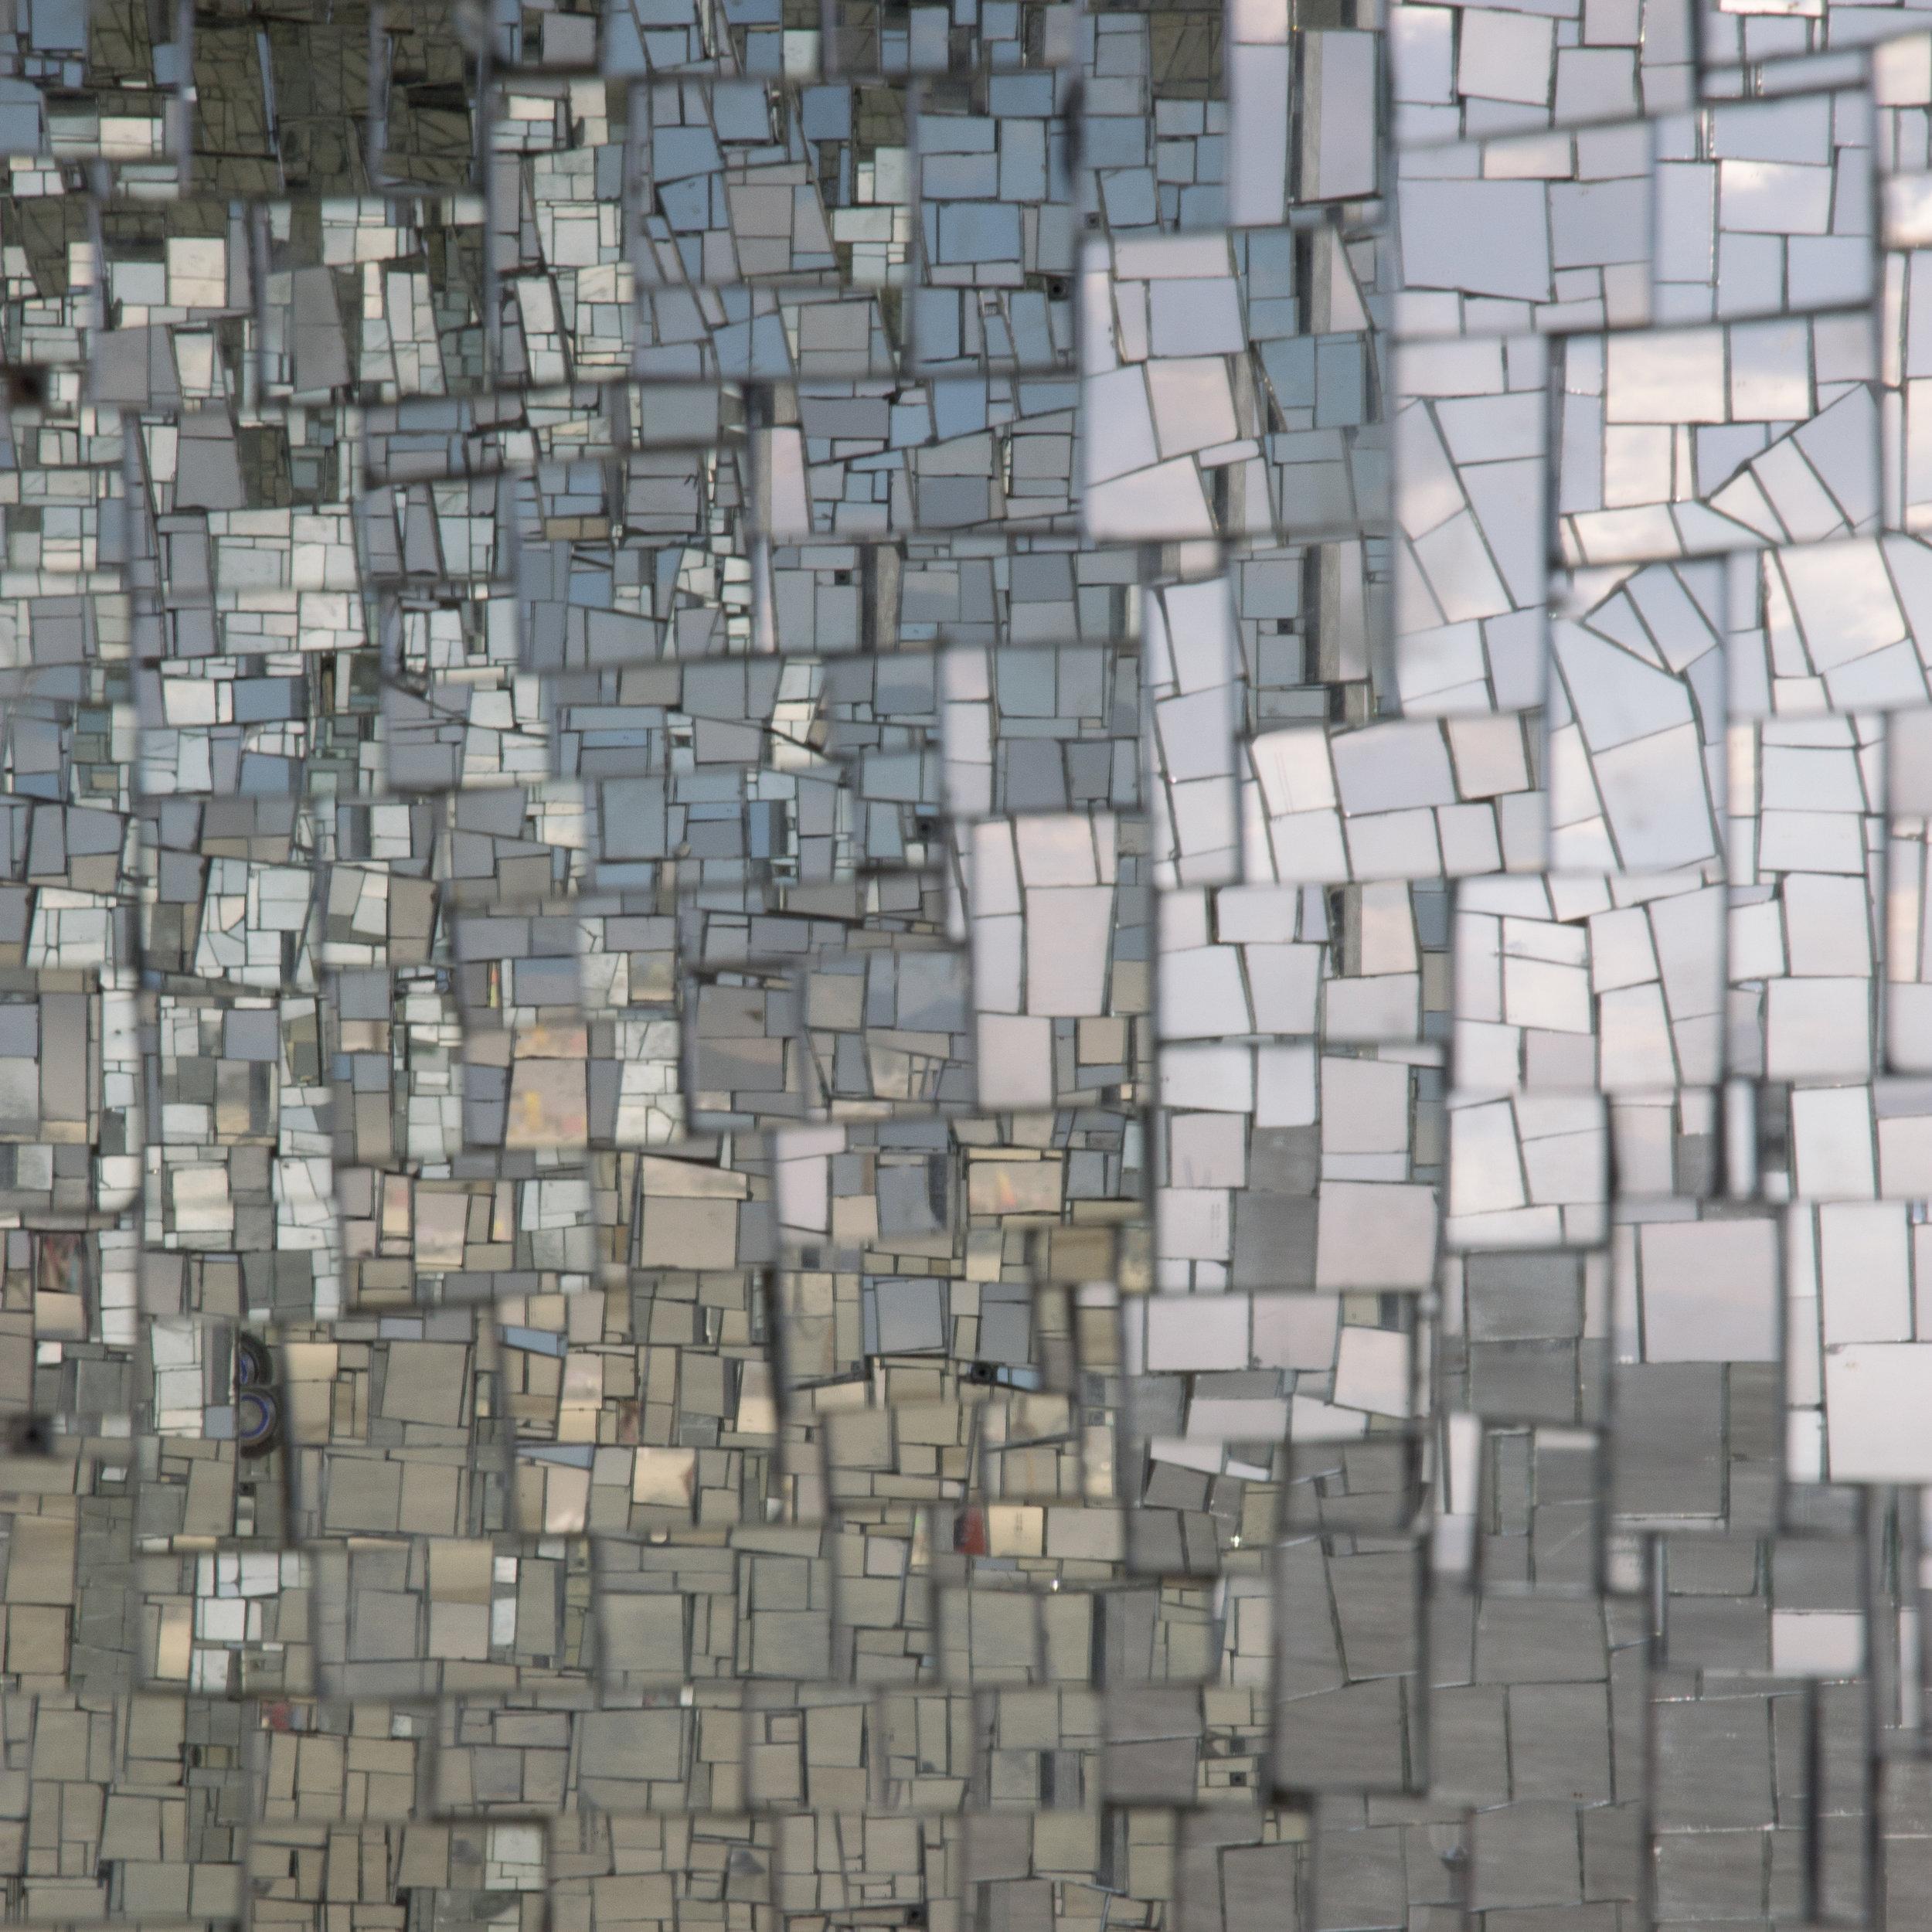 Mosaic Sq_9915.jpg